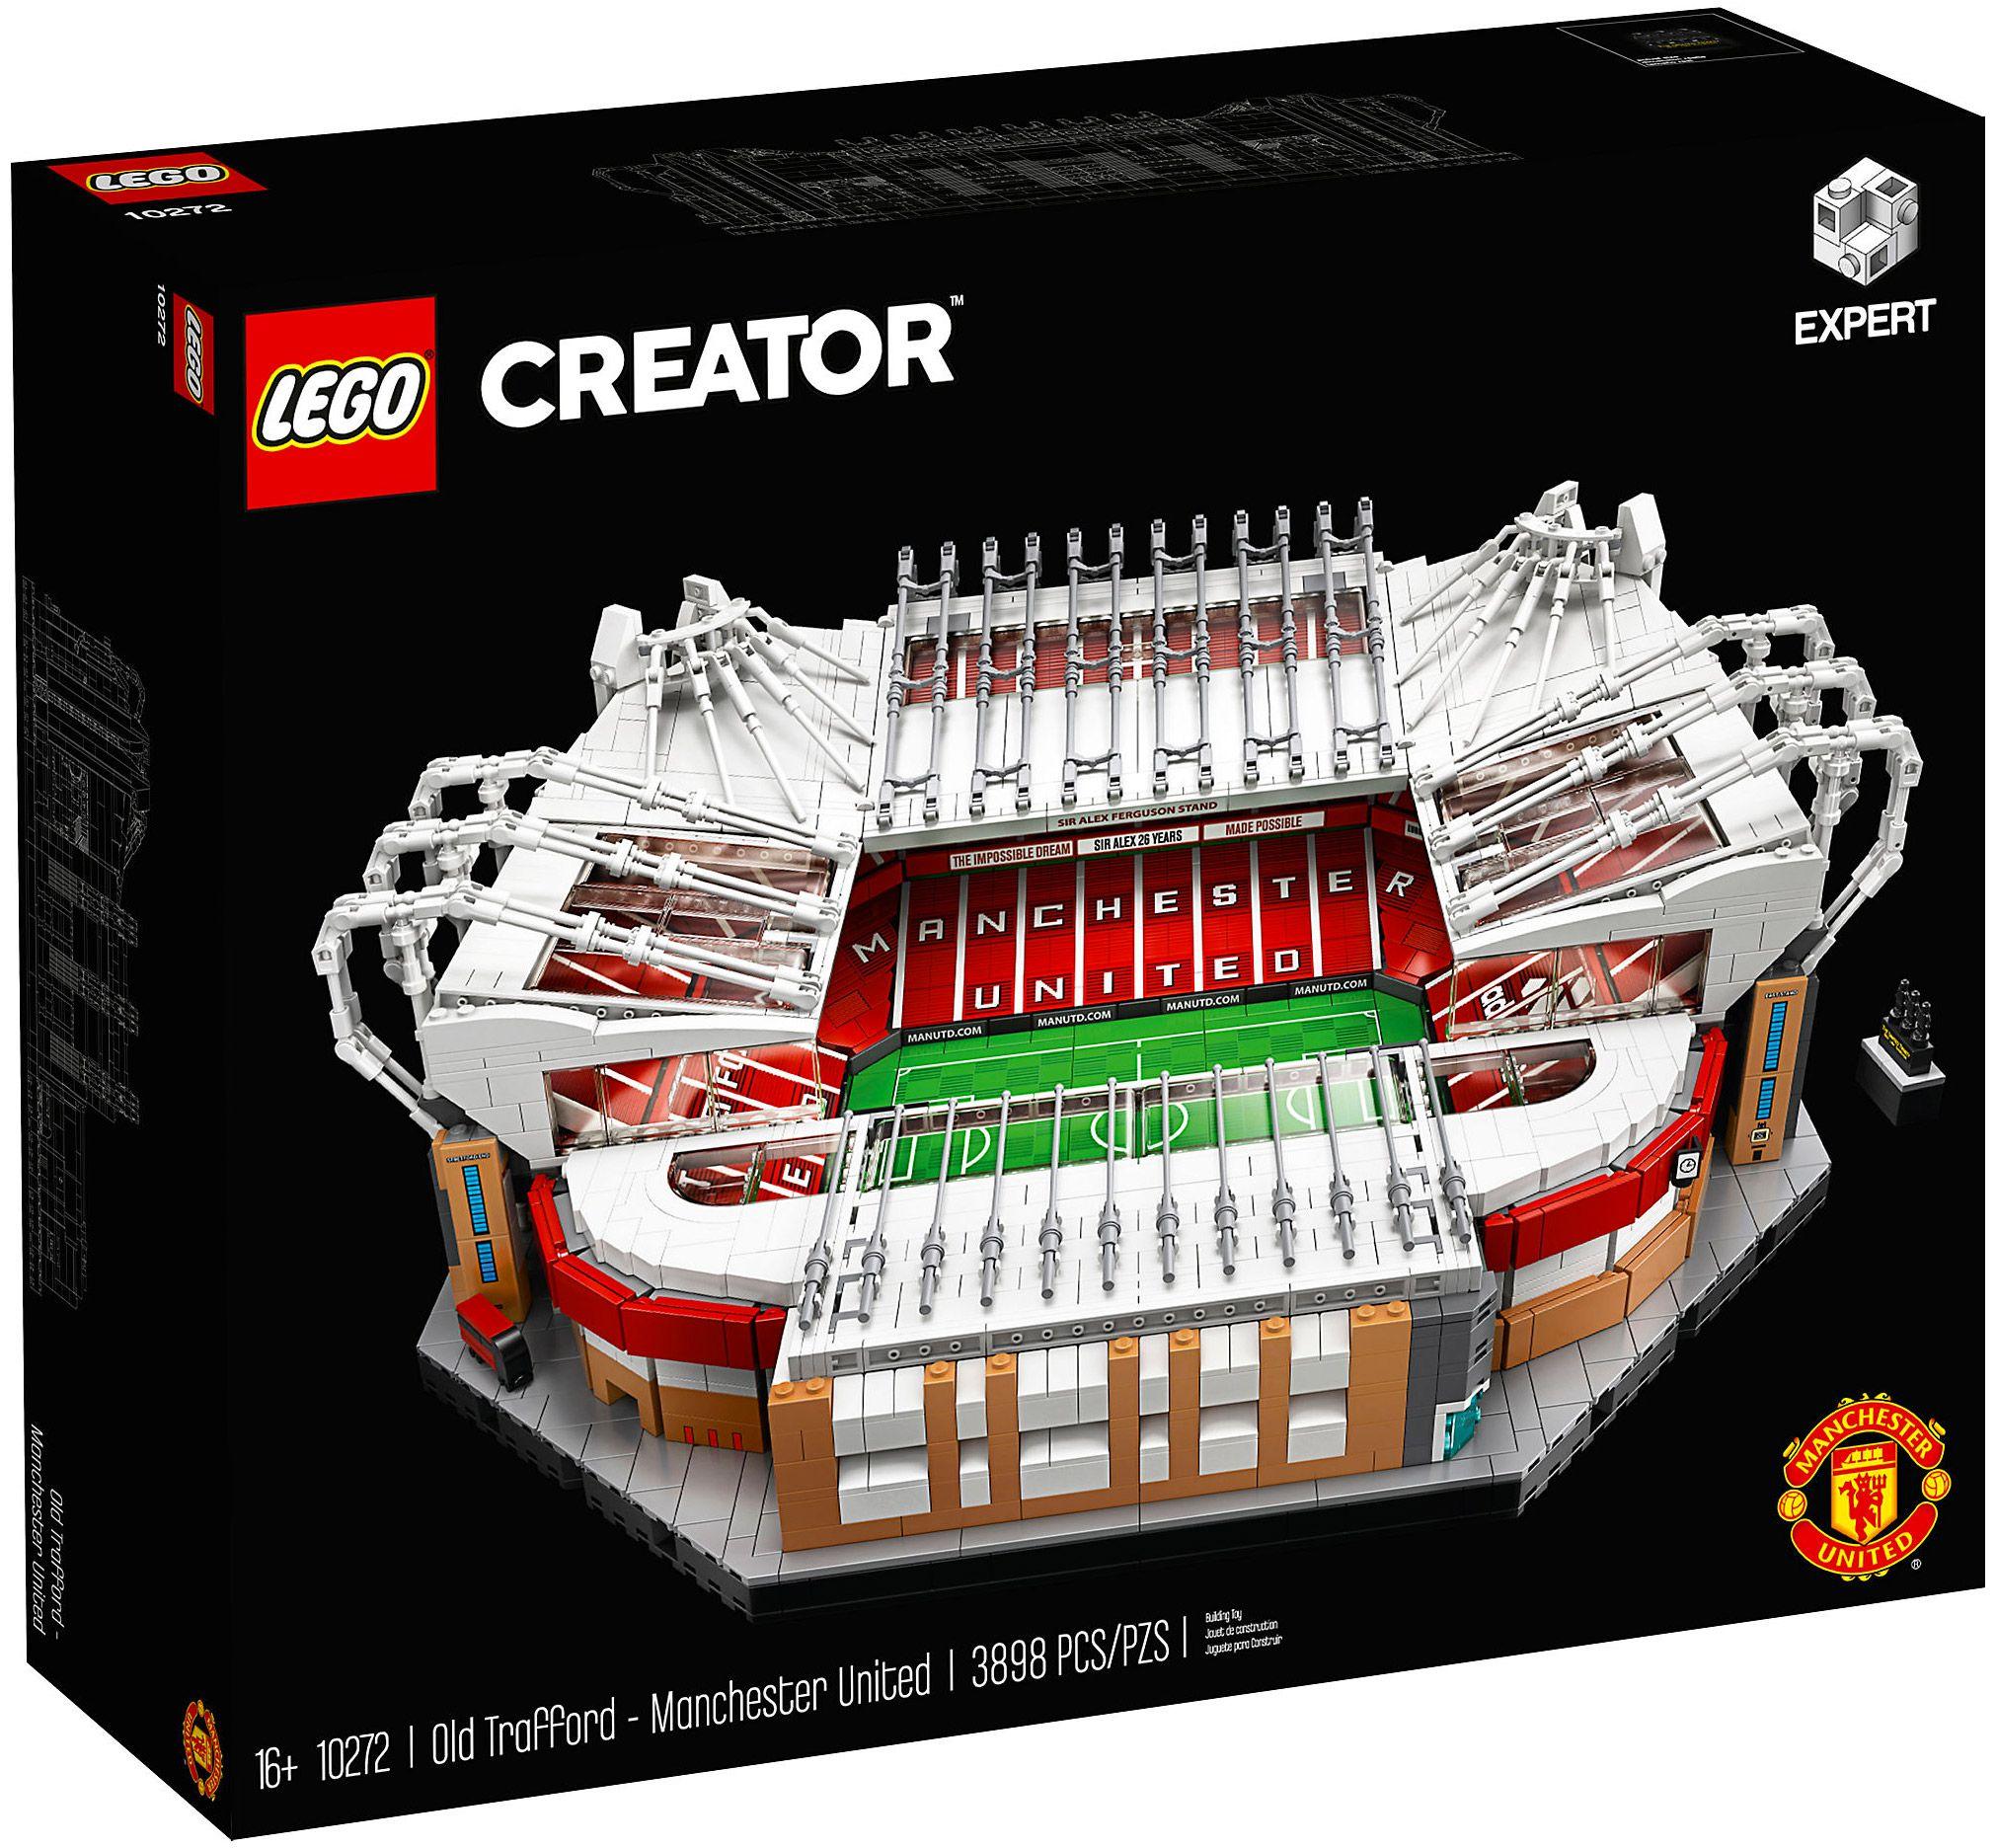 NOUVEAU /& NEUF dans sa boîte LEGO Creator 10272 Old Trafford Manchester United Stade